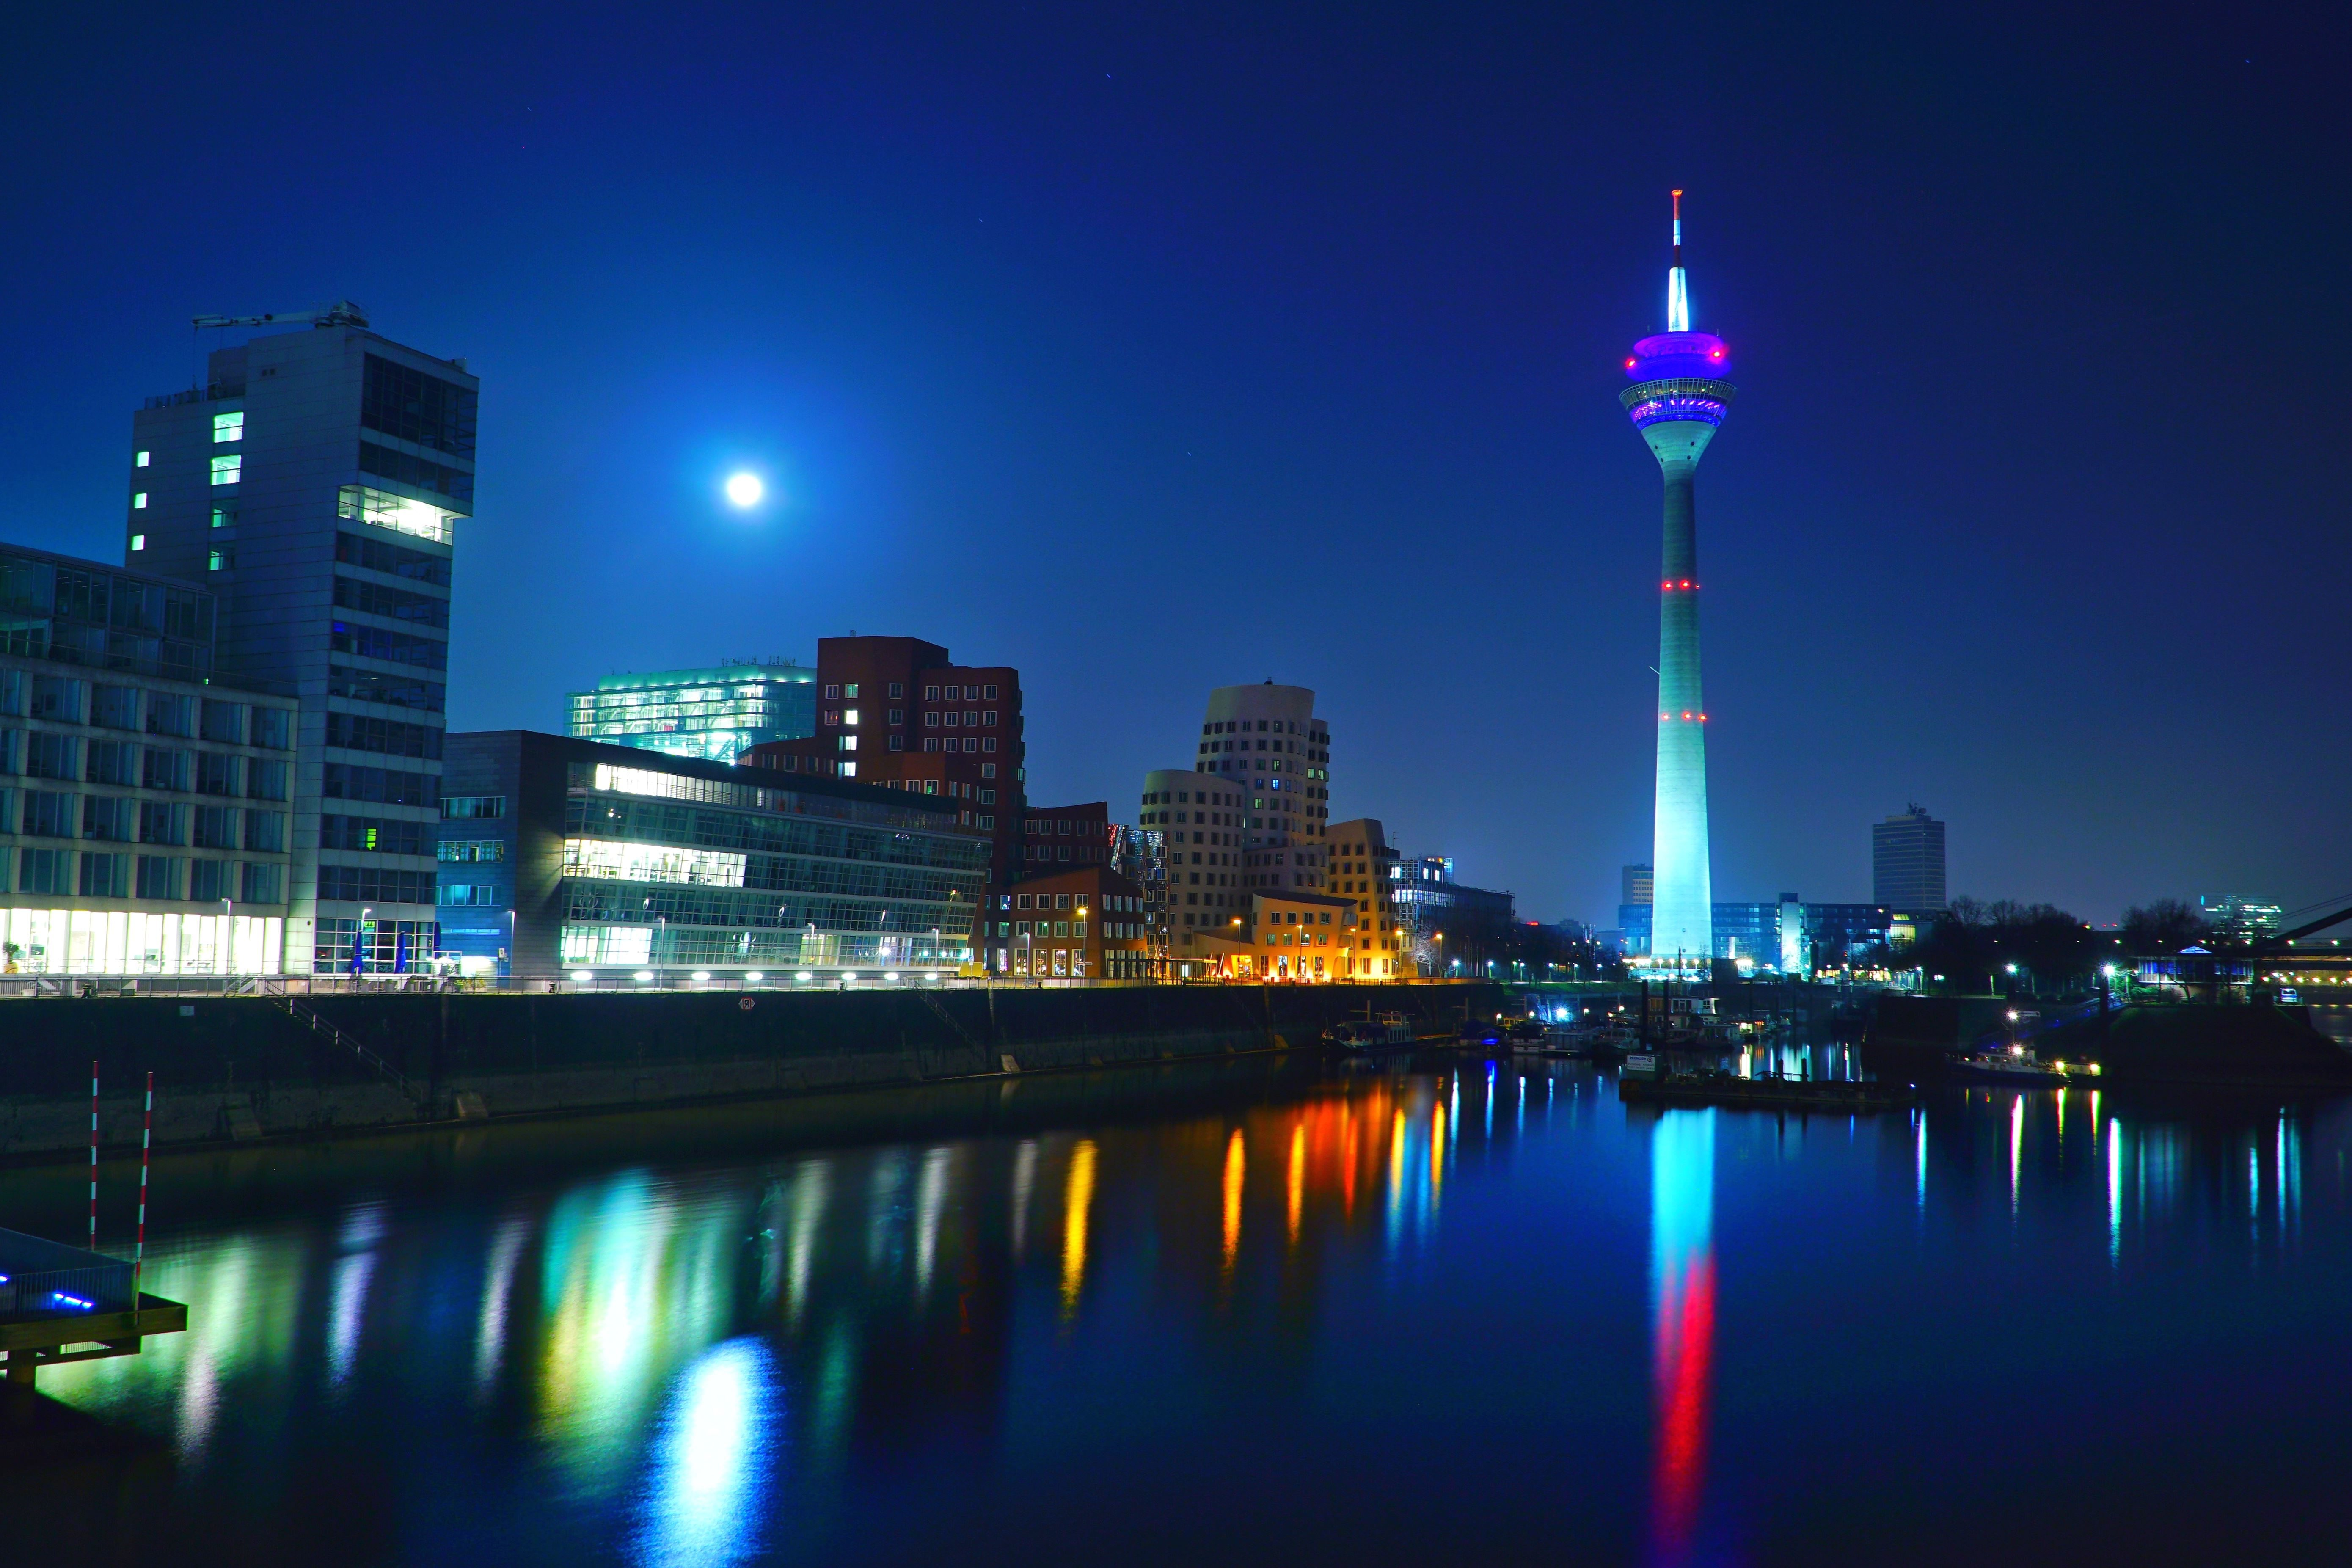 imagen gratis  arquitectura  edificios  negocios  torre